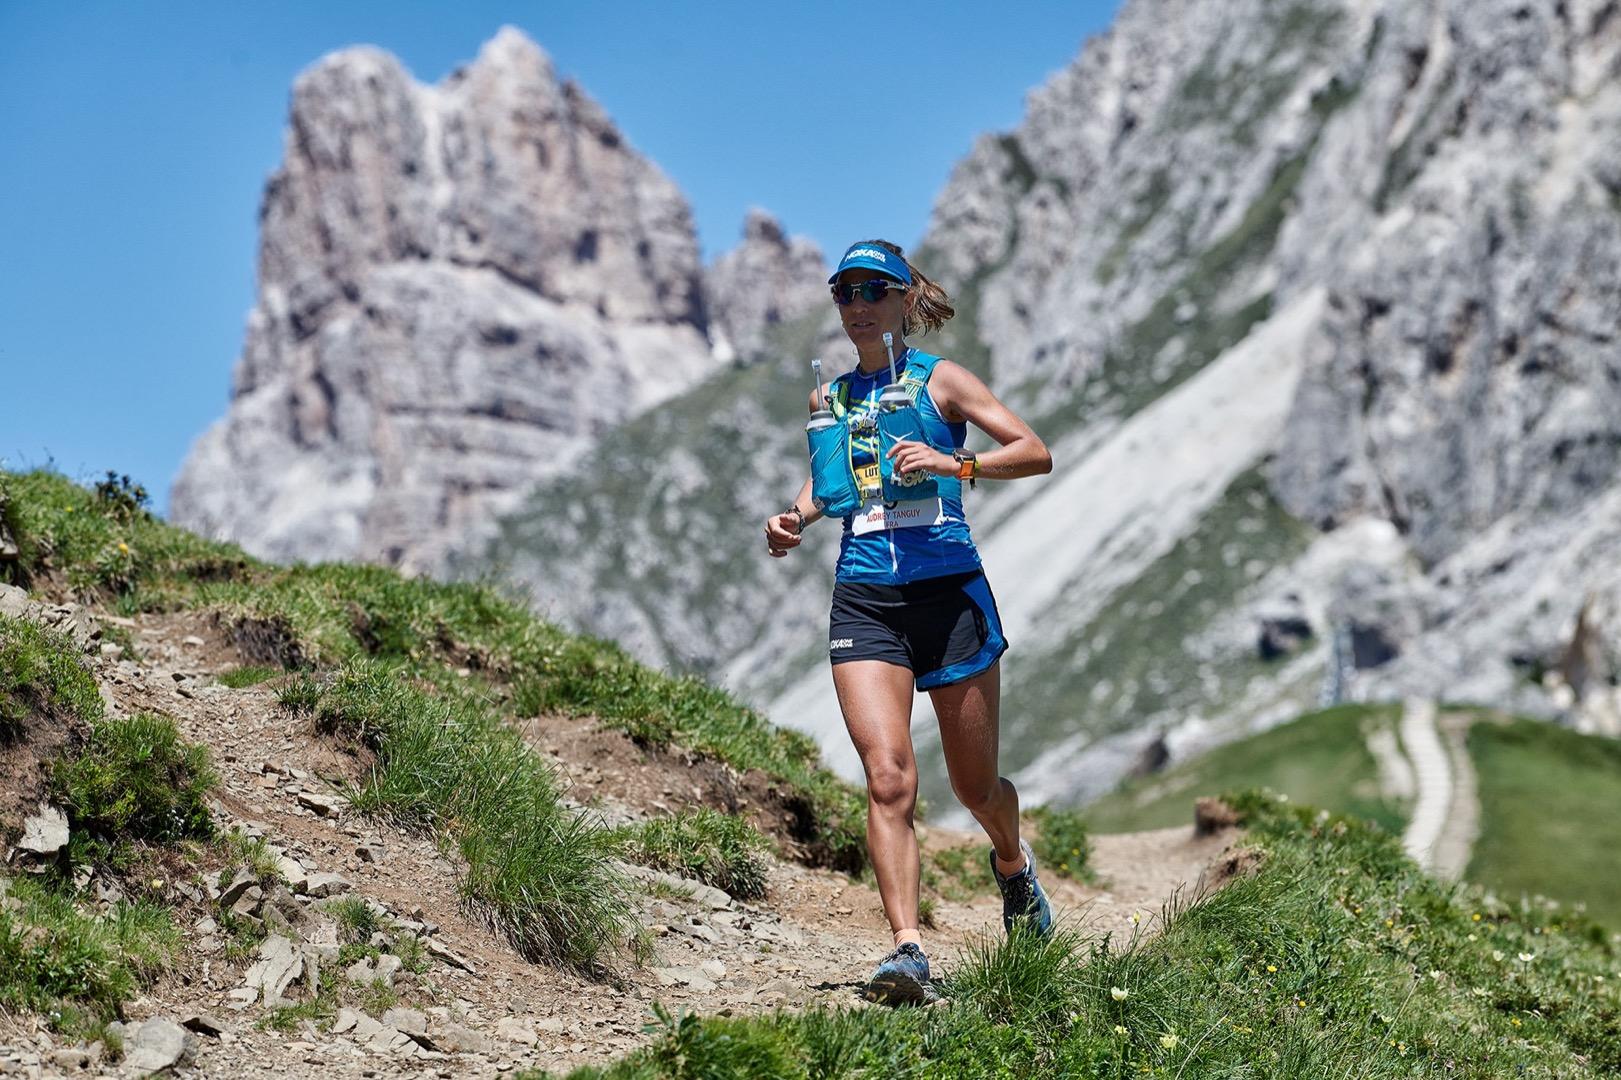 Penyagolosa Trails 2020 con acento femenino